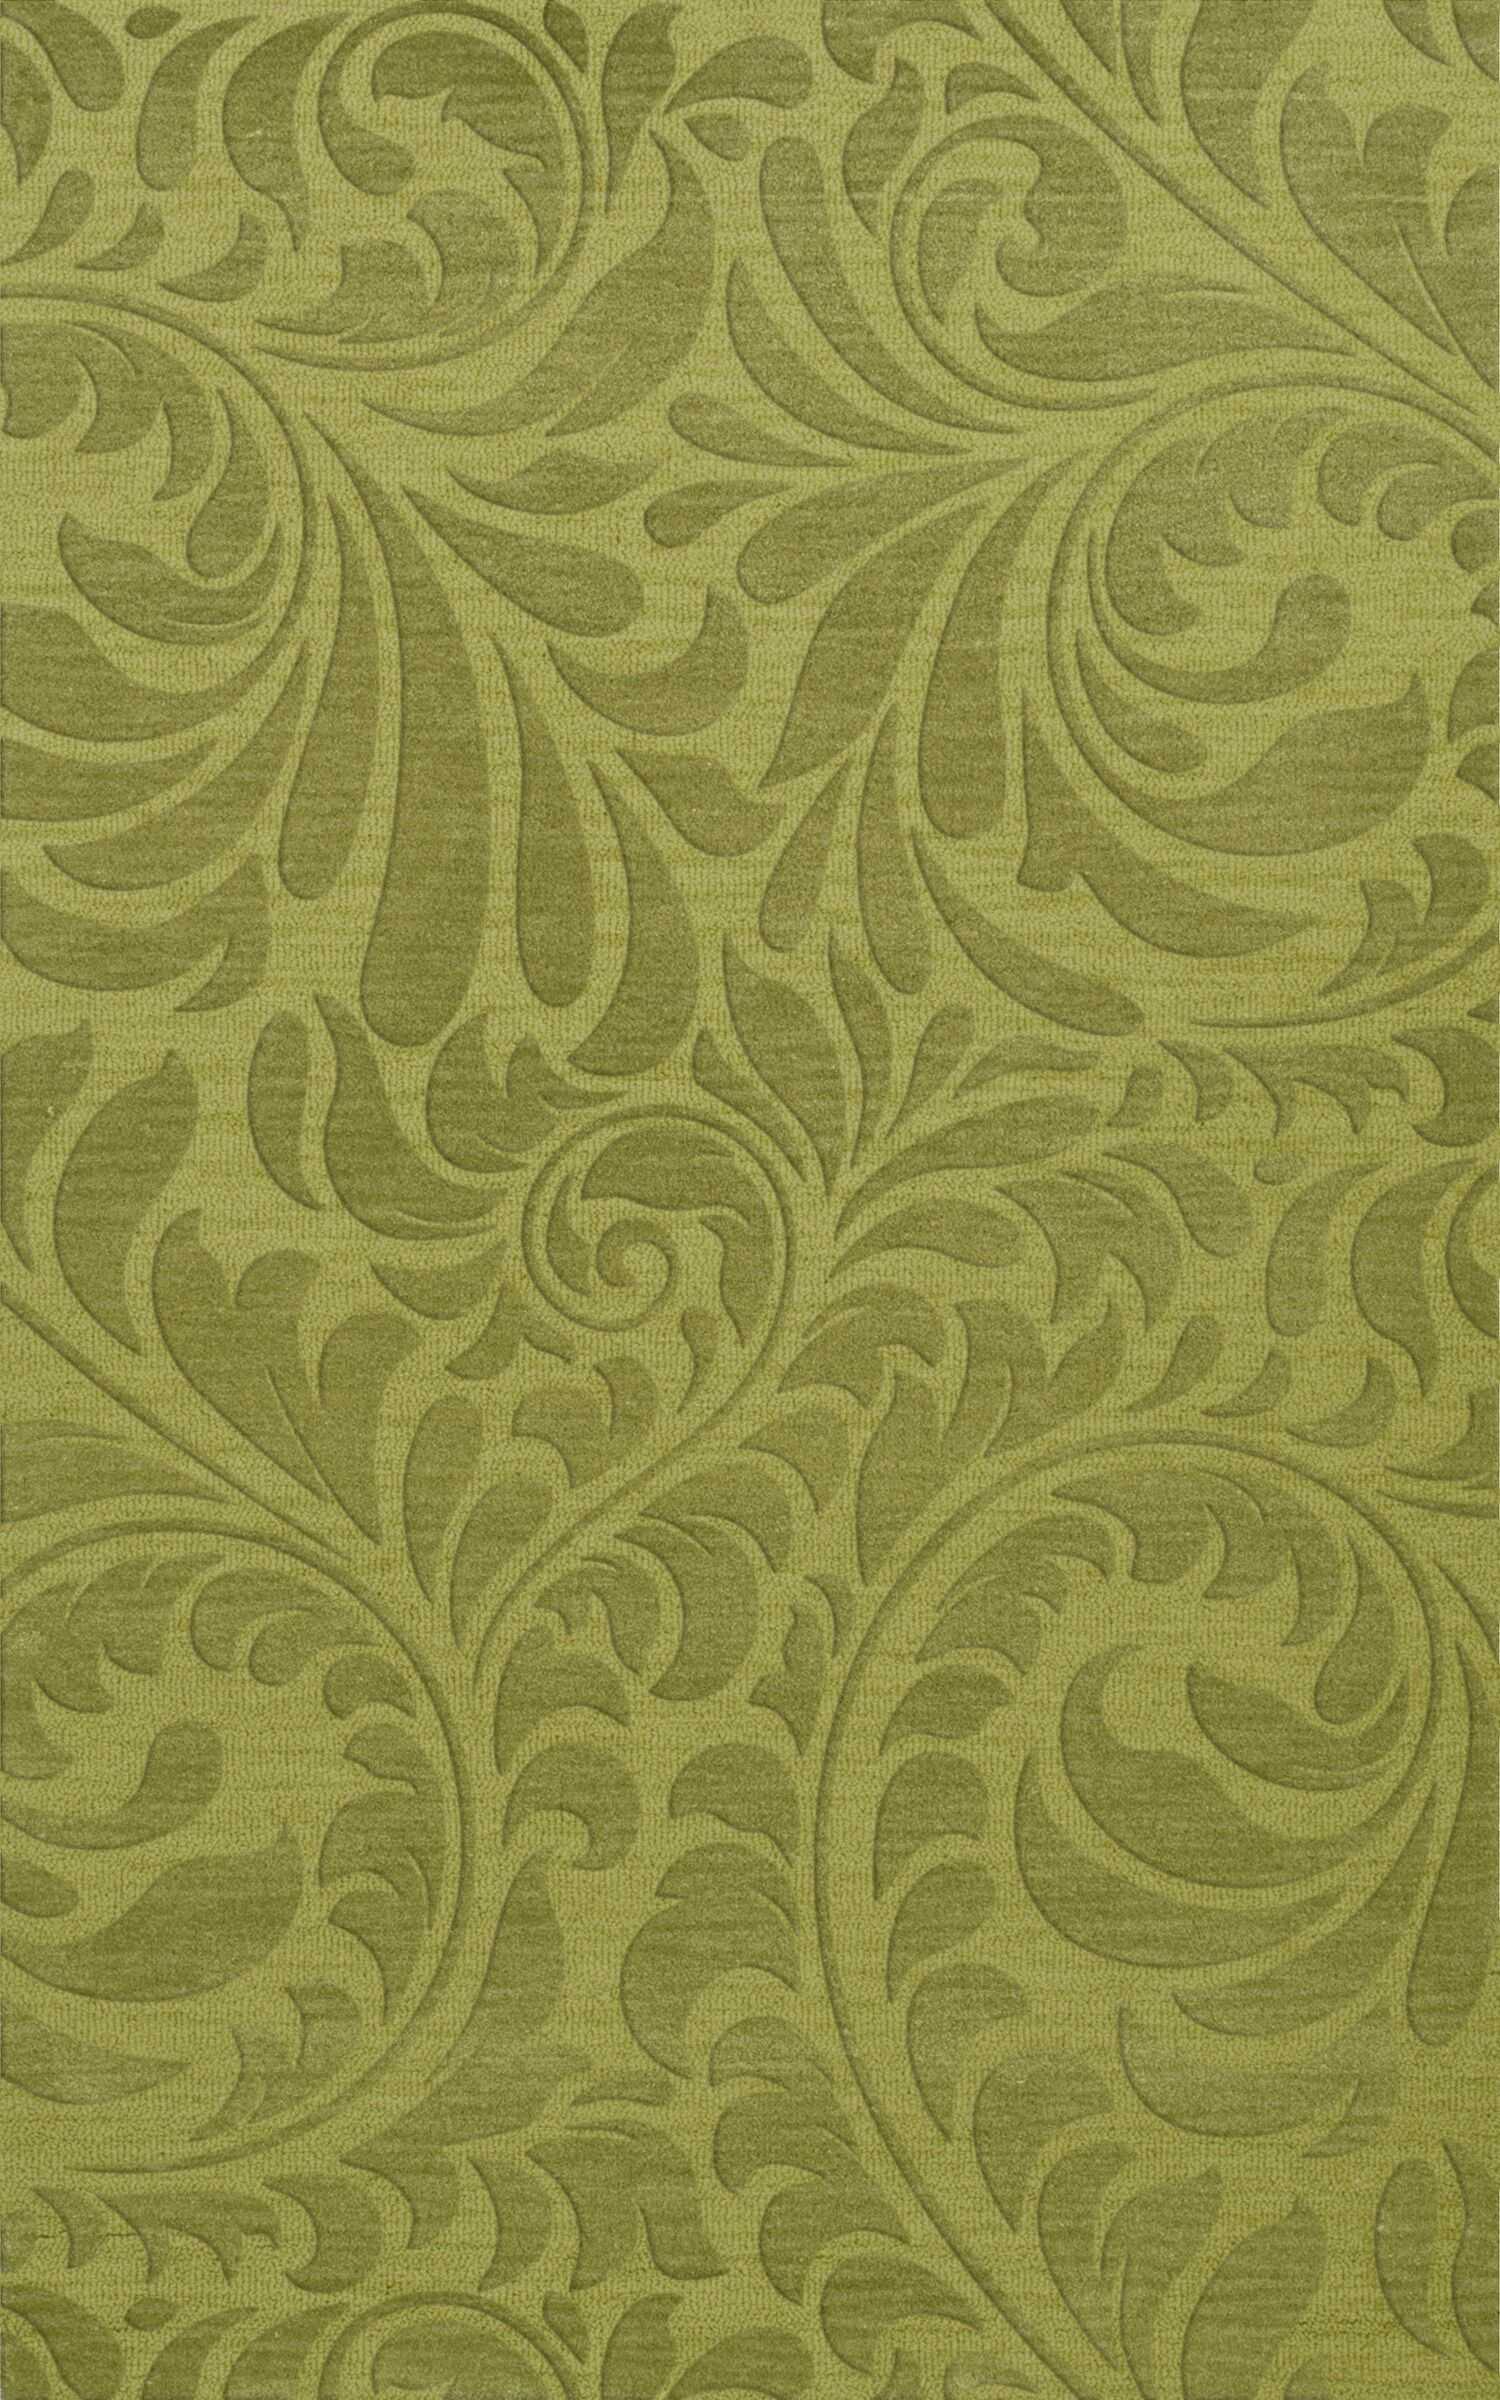 Bella Machine Woven Wool Green Pad Area Rug Rug Size: Rectangle 6' x 9'